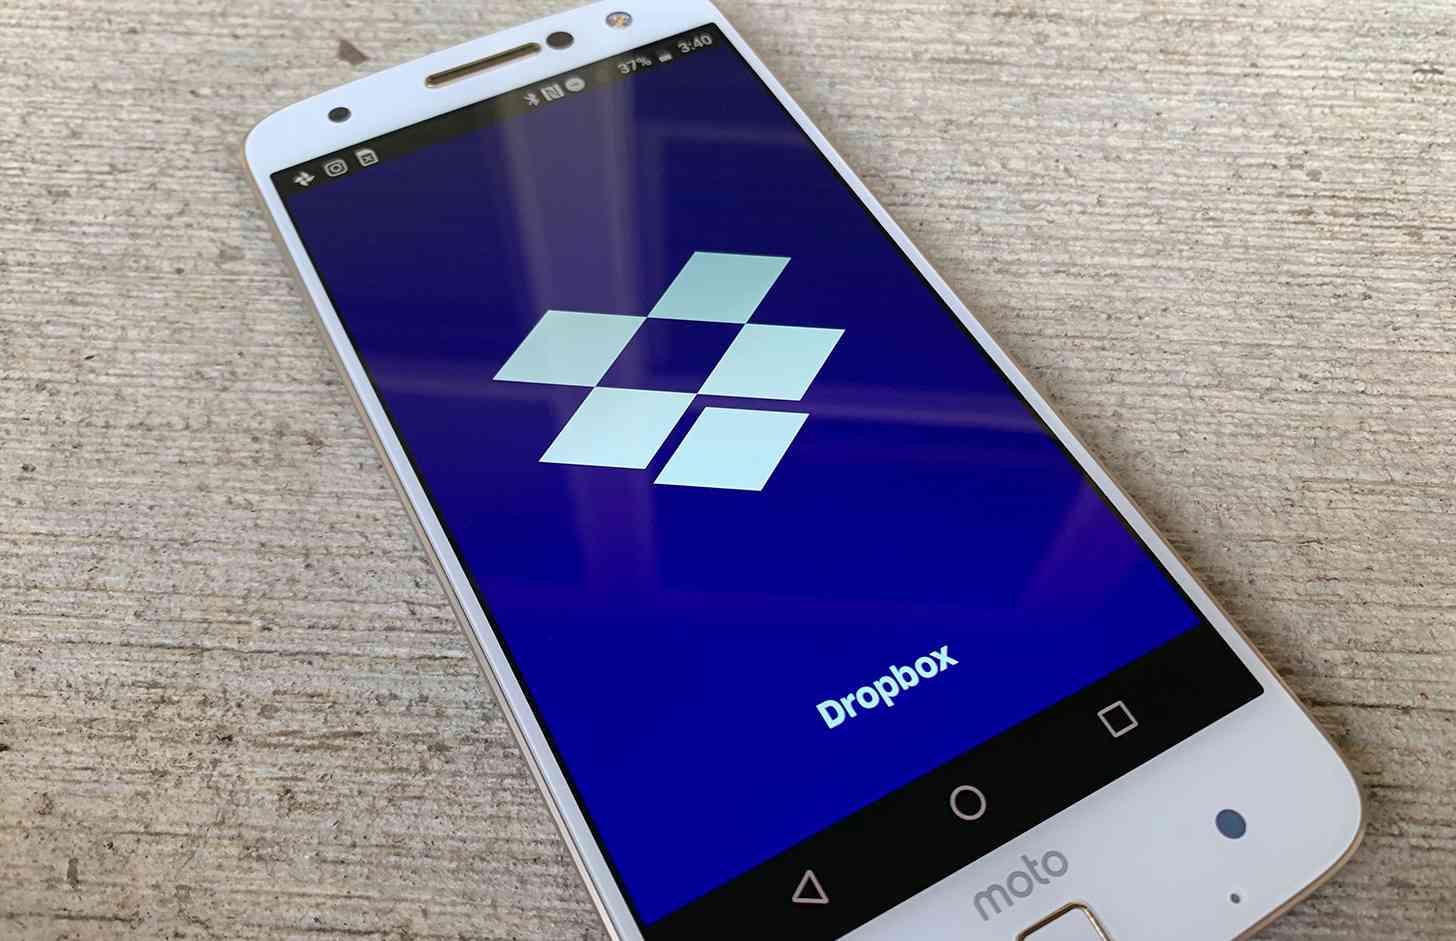 Dropbox Android app